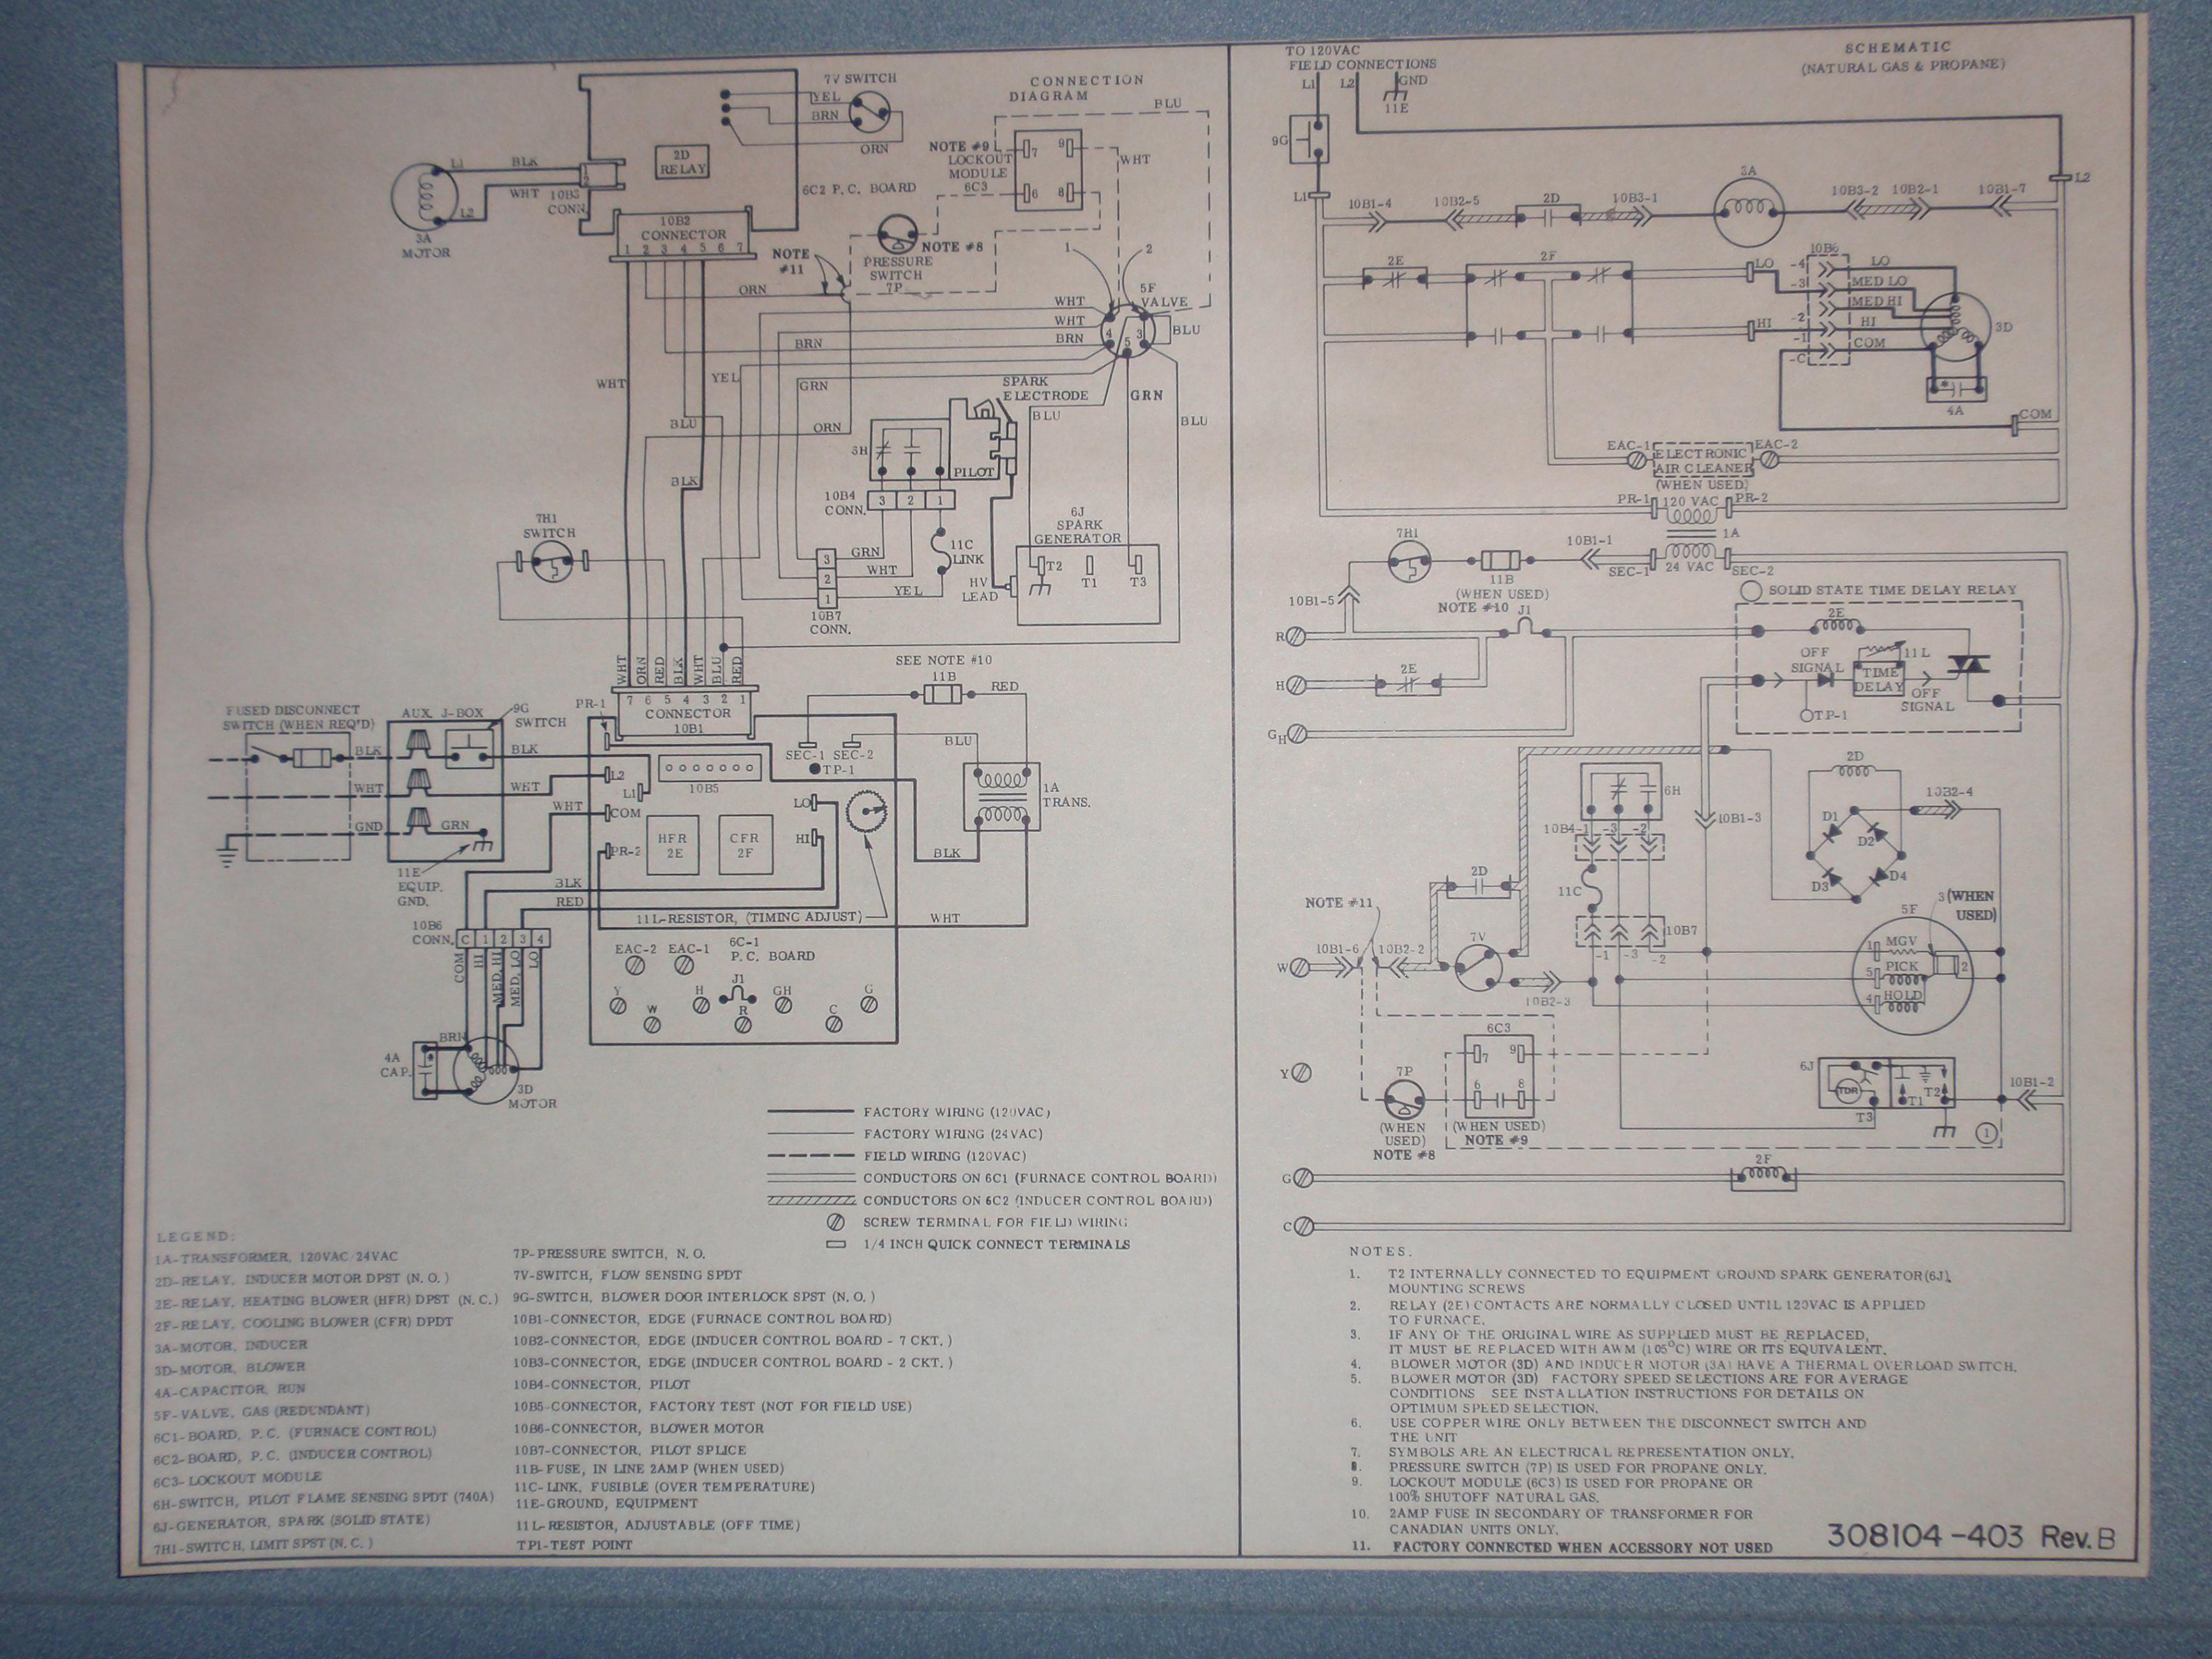 Payne Air Handler Wiring Diagram Payne Electric Furnace Wiring Diagram Wiring Diagram Options Of Payne Air Handler Wiring Diagram